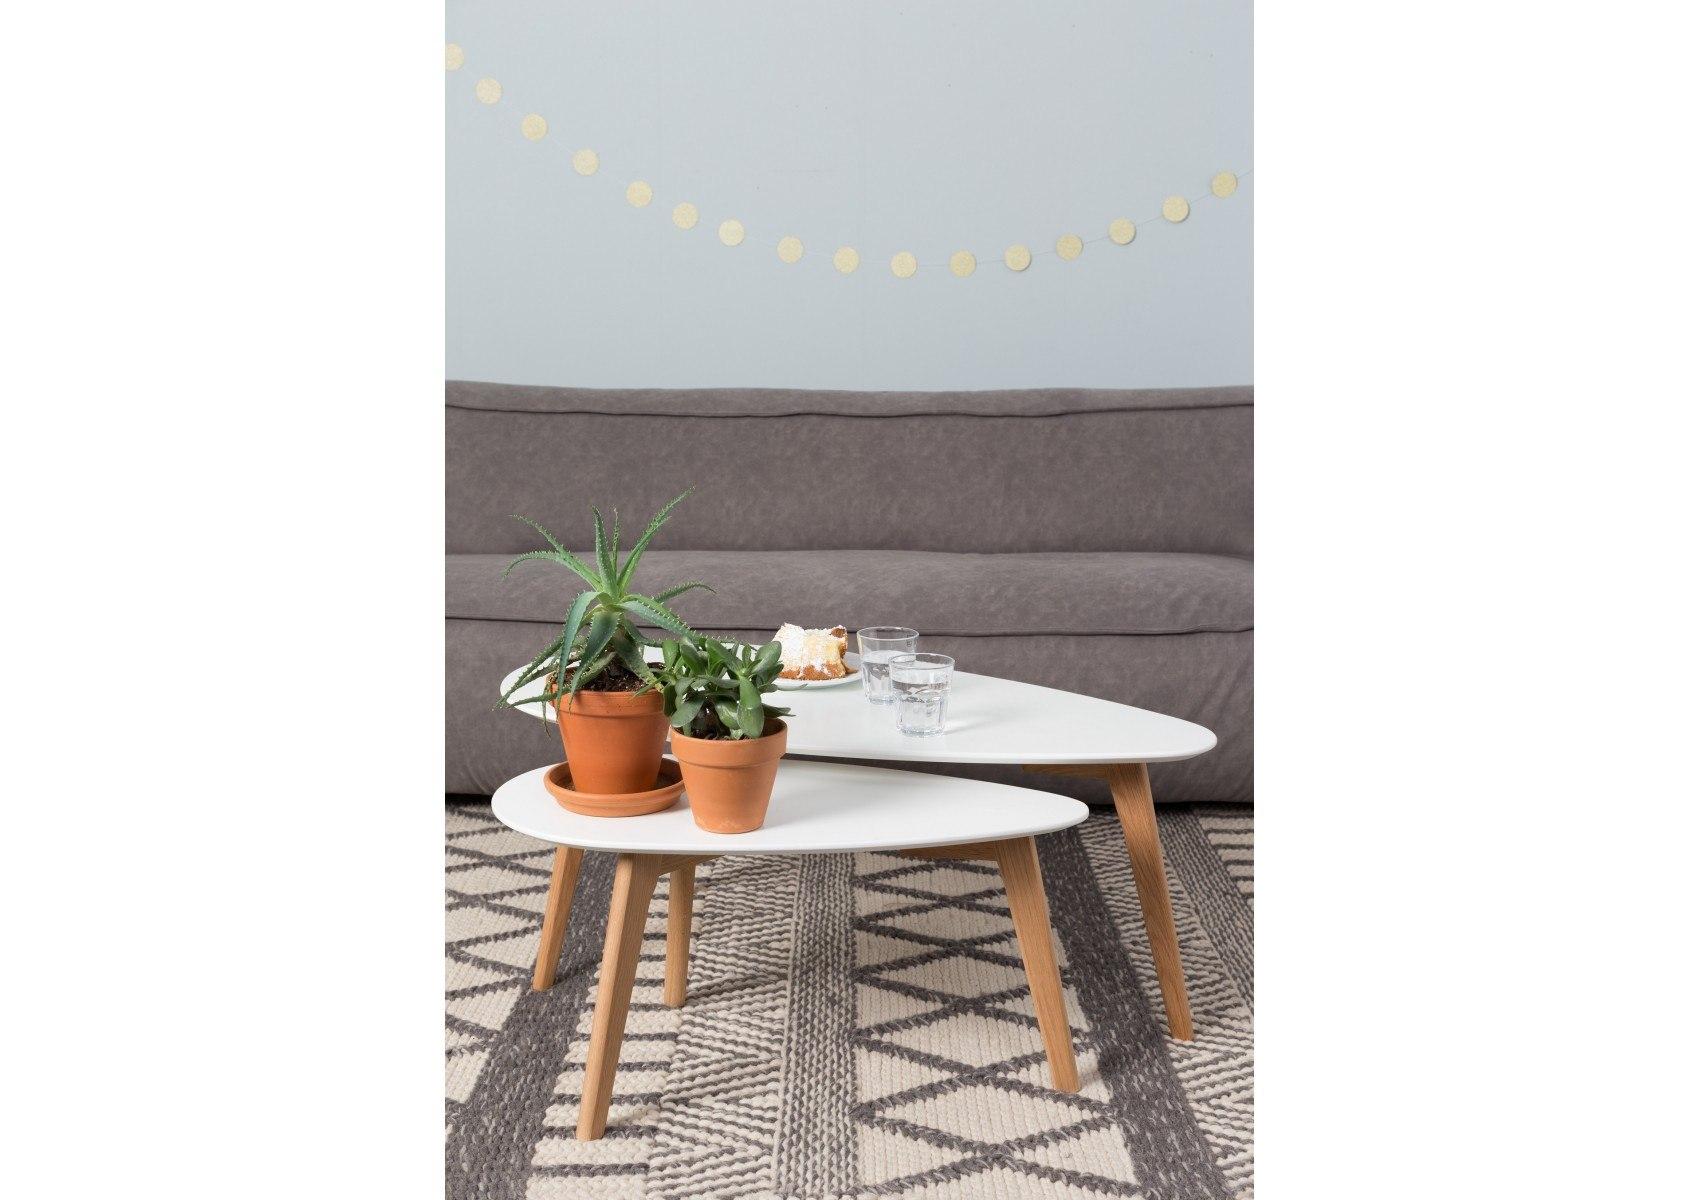 tables basse scandinave drop laqu e blanche. Black Bedroom Furniture Sets. Home Design Ideas